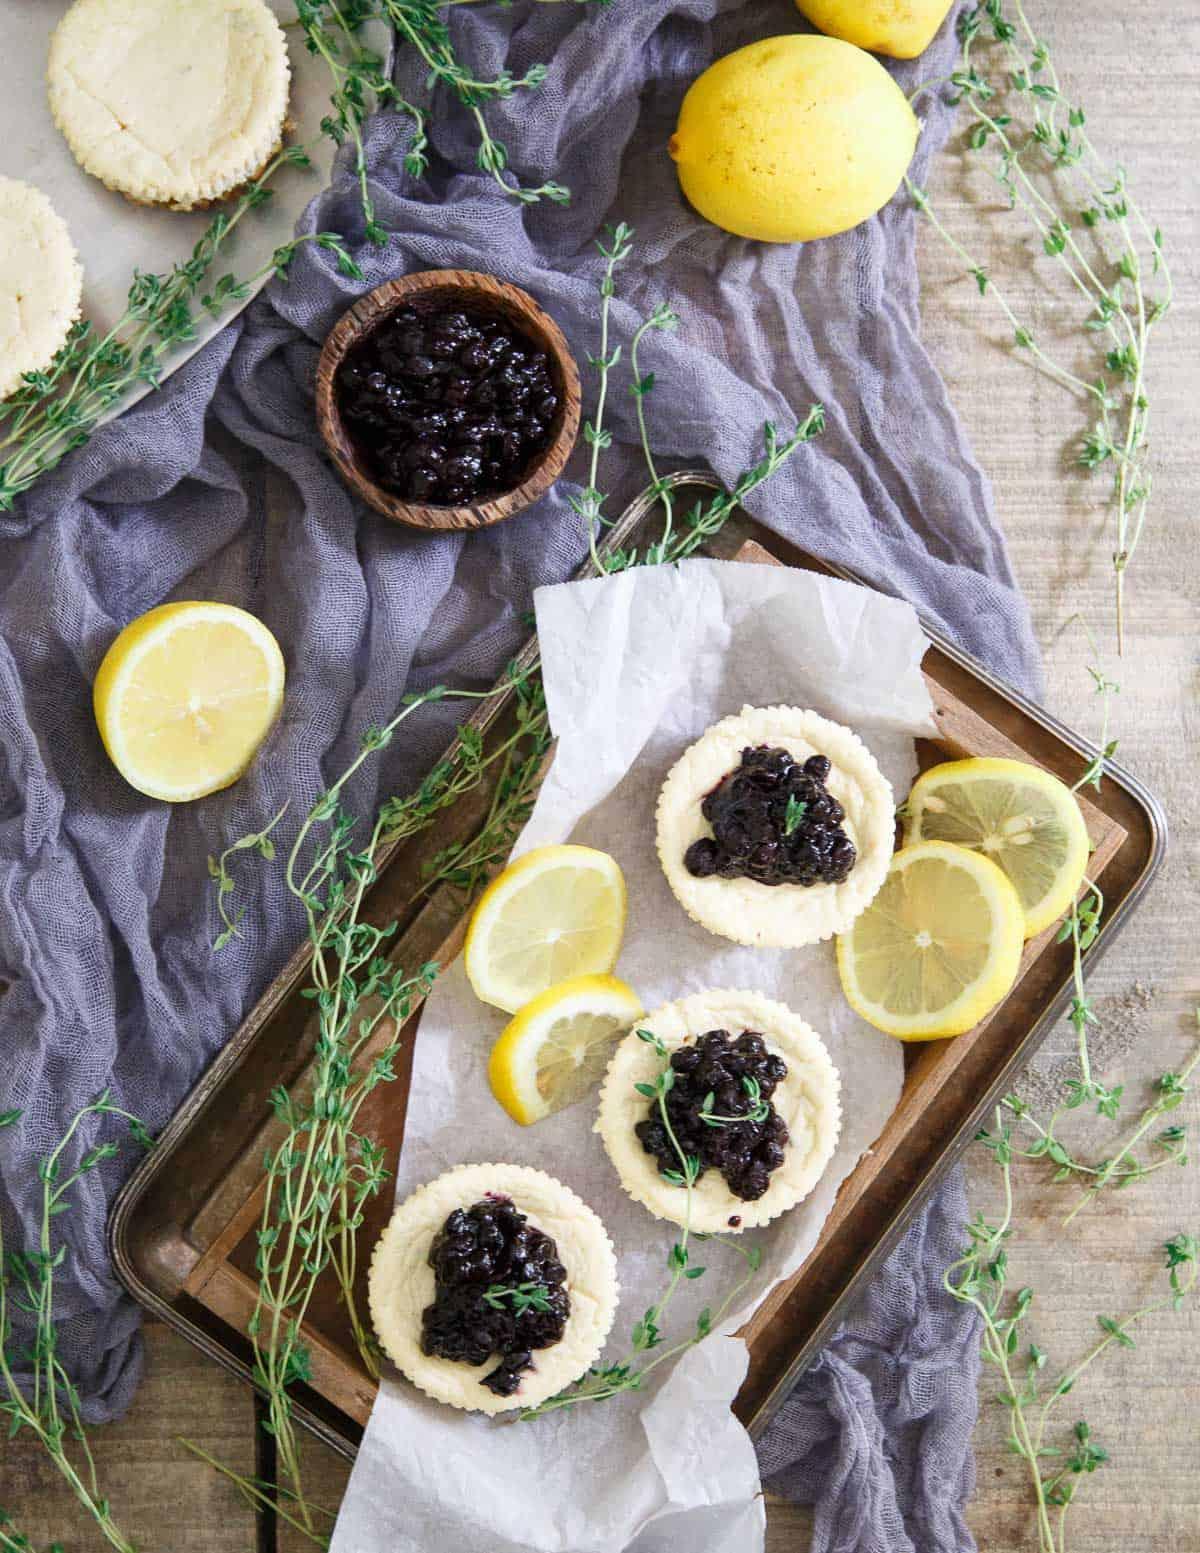 Lemon Thyme Blueberry Mini Cheesecakes are a delicious gluten free sweet bite